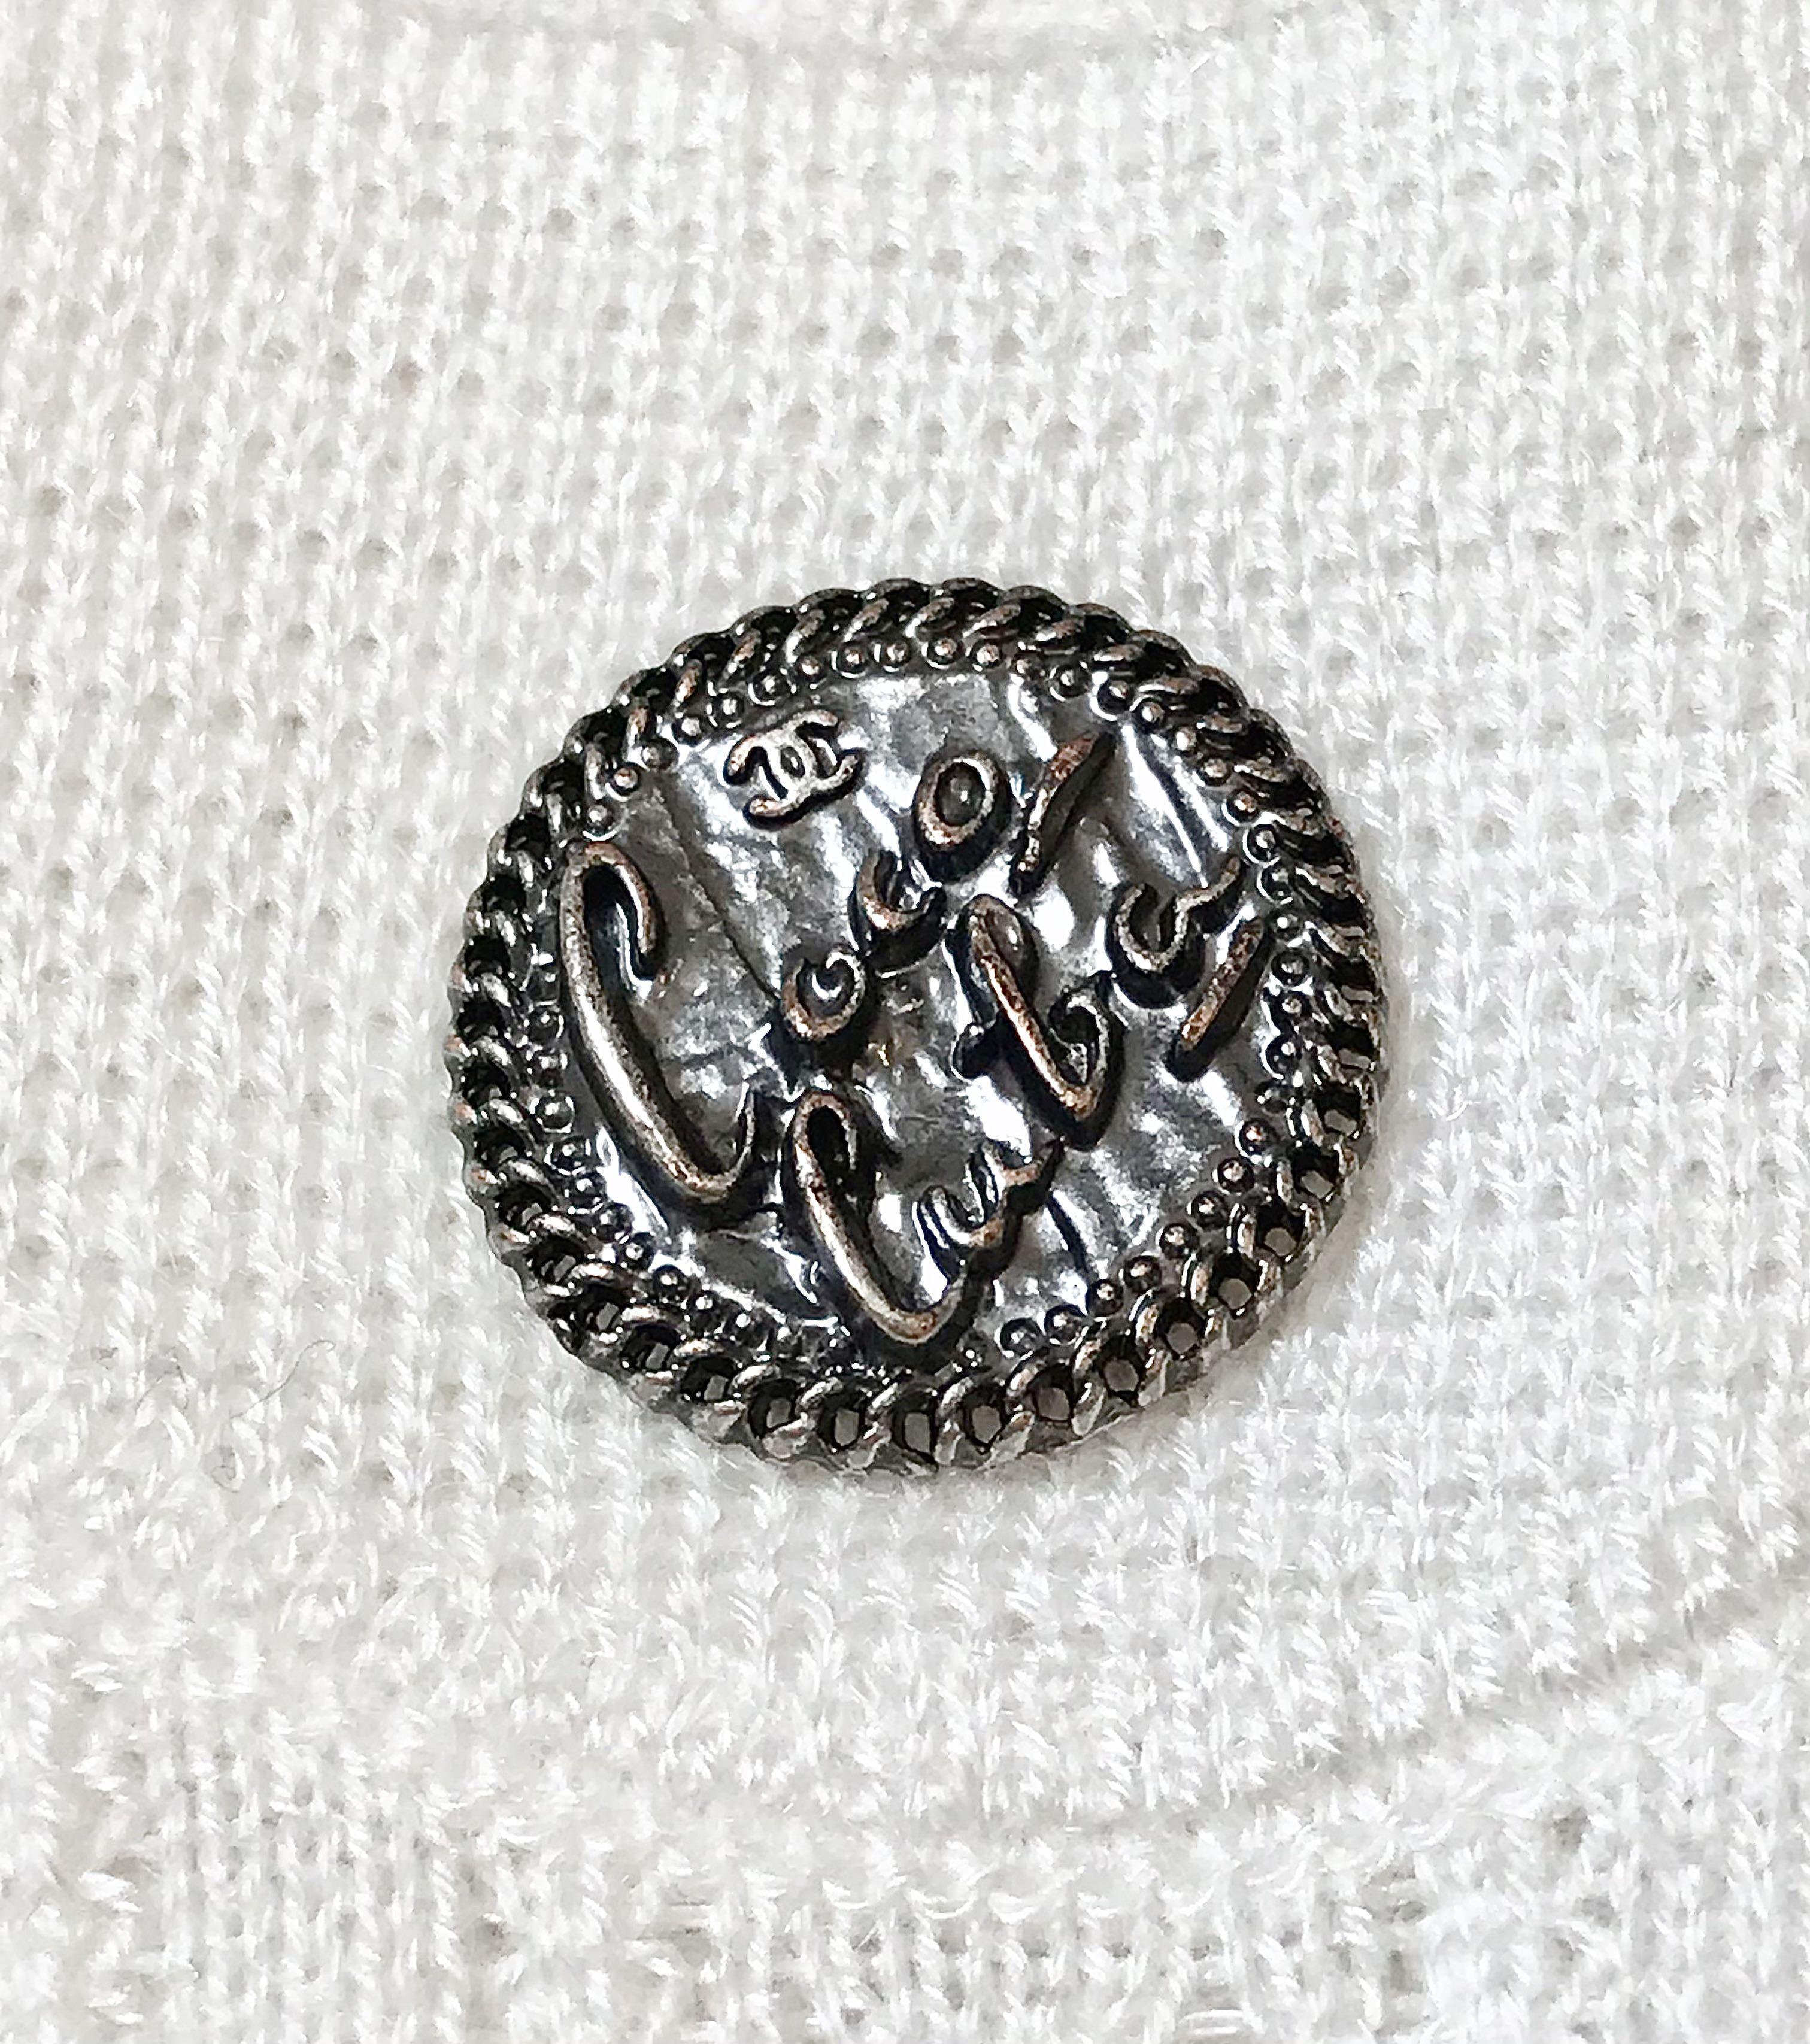 Chanel 經典四口袋鏤空針織開衫(34碼)